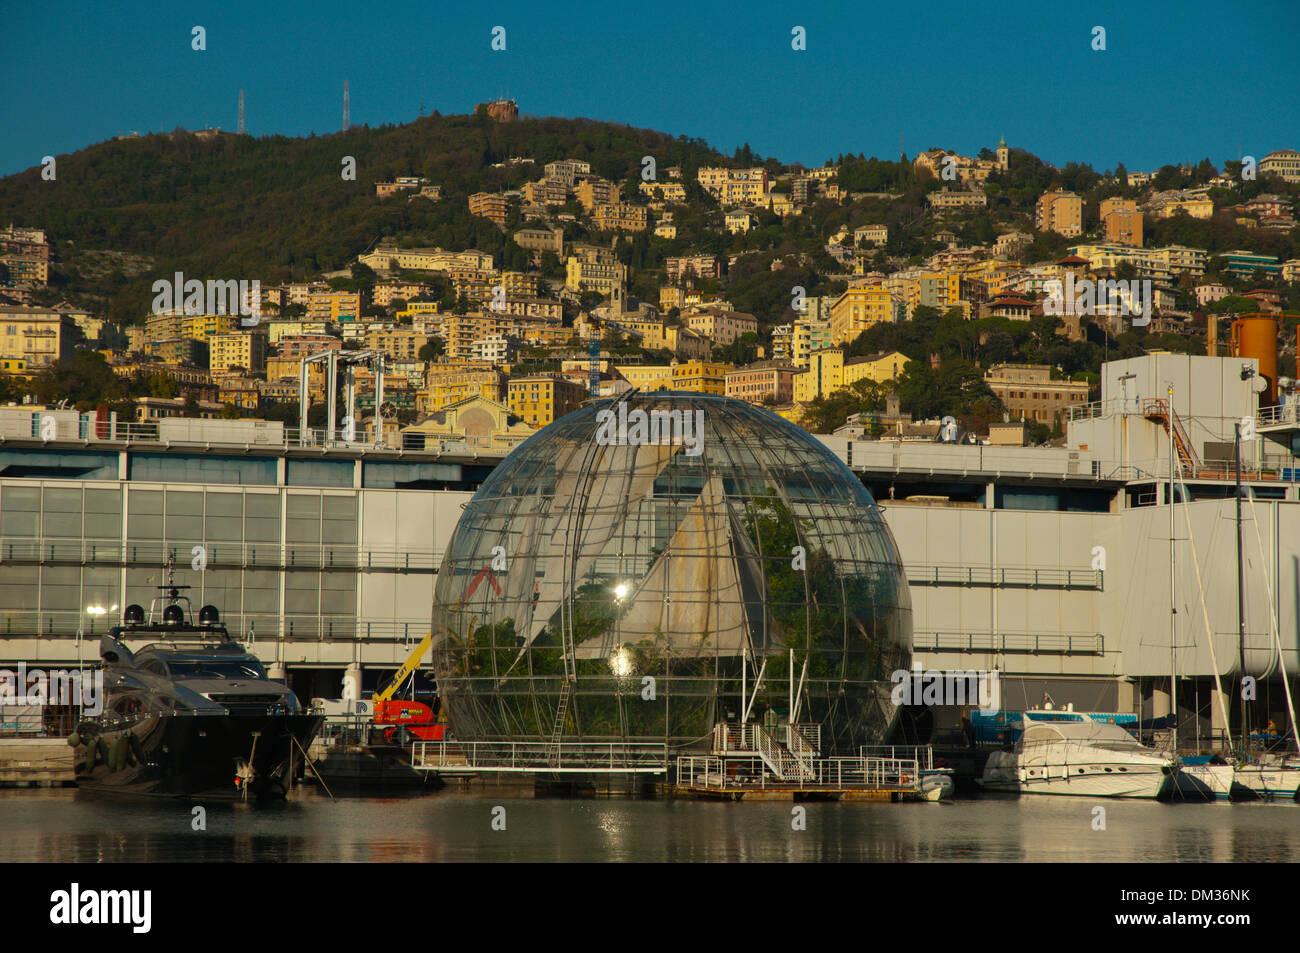 Biosfera by Renzo Piano housing tropical ecosystem Porto Antico the old port Genoa Liguria region Italy Europe - Stock Image